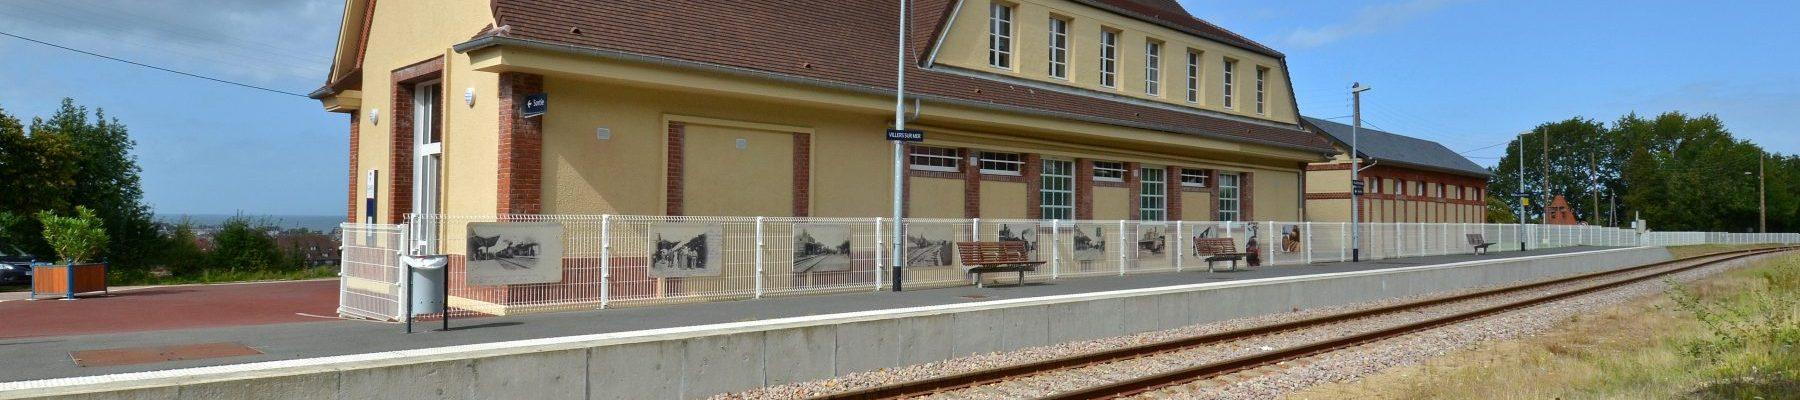 Gare de Villers-sur-Mer